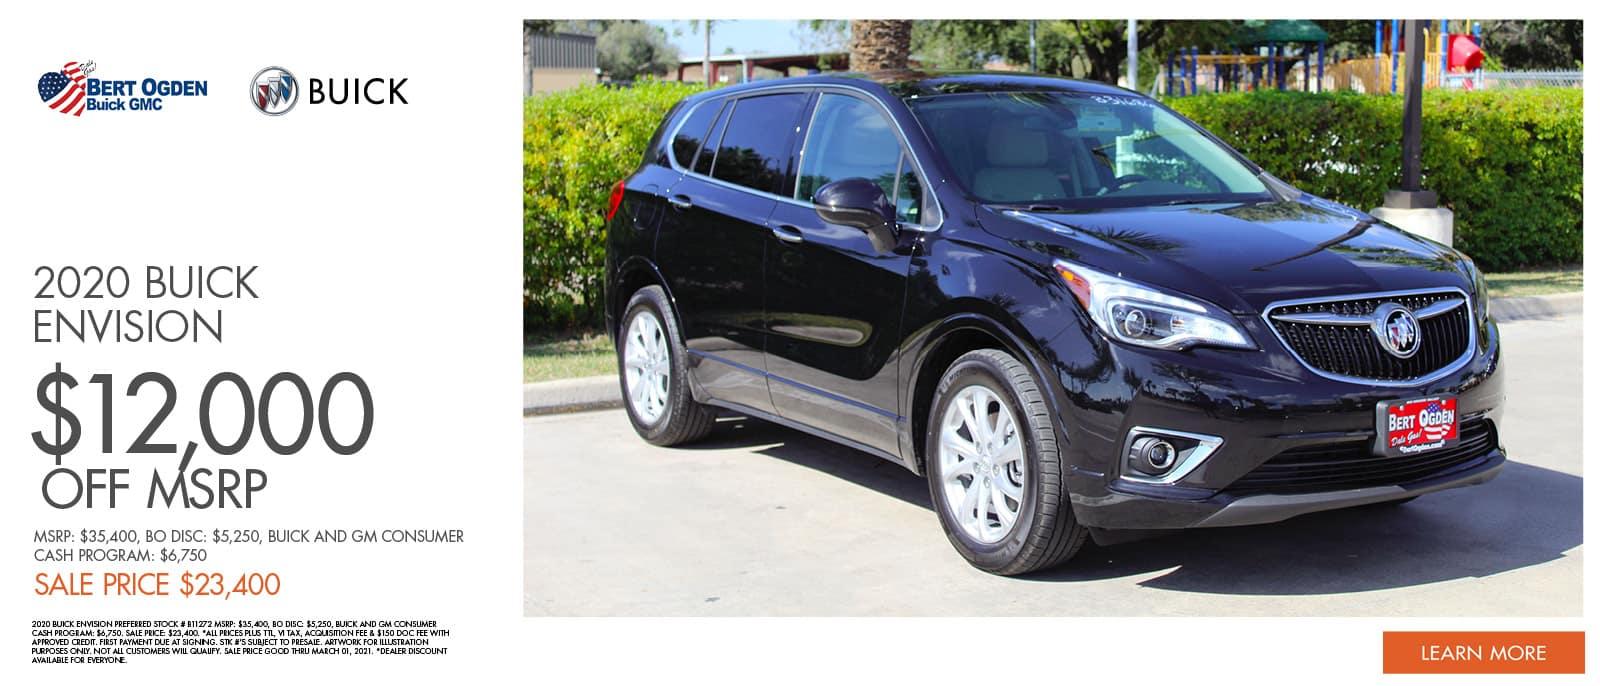 2020 Buick Envision Specials | Bert Ogden Buick GMC | Edinburg, TX